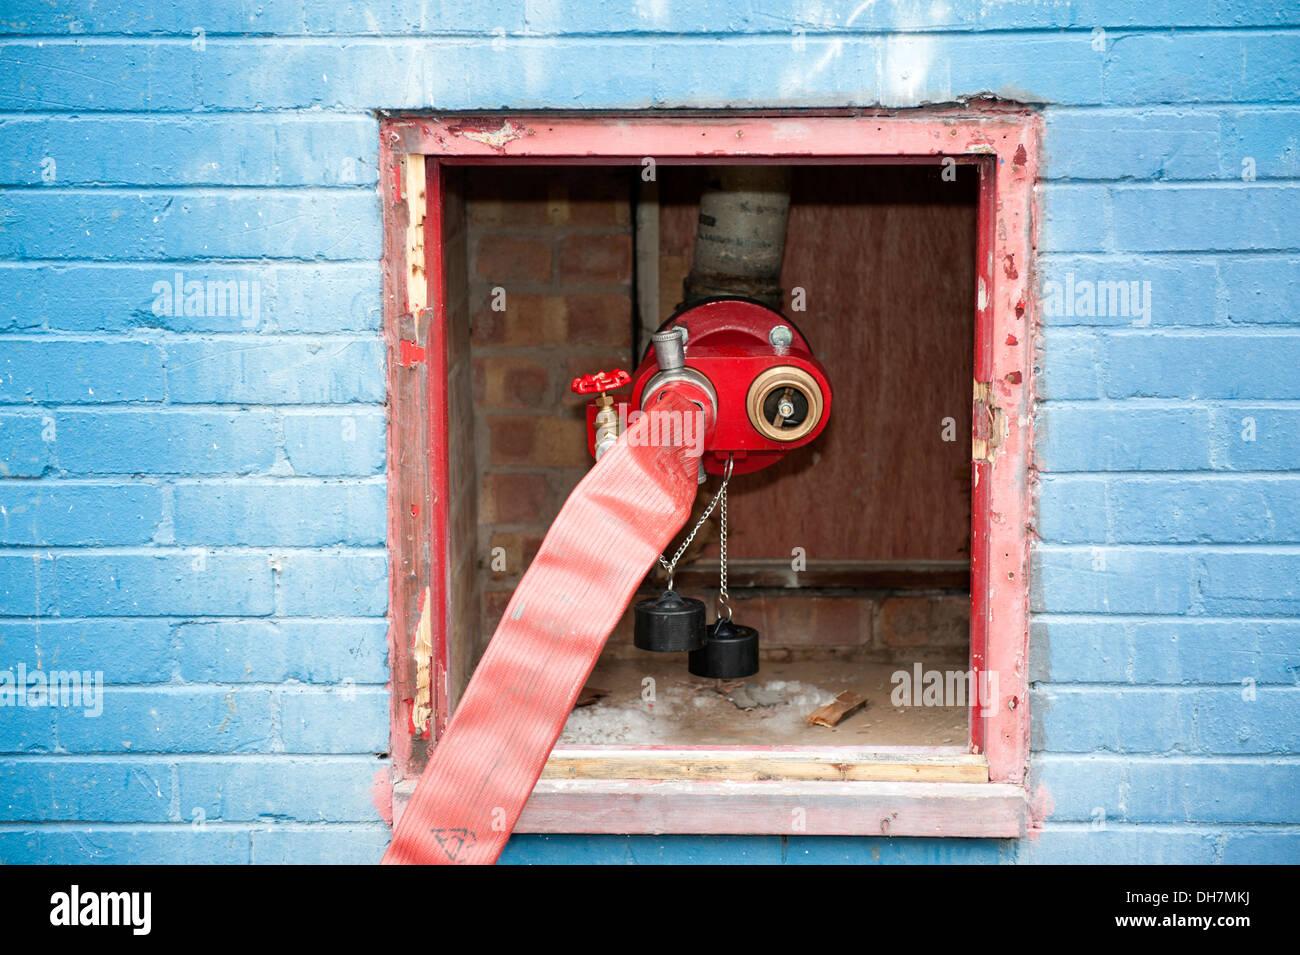 Fire hose feeding dry riser inlet valve - Stock Image